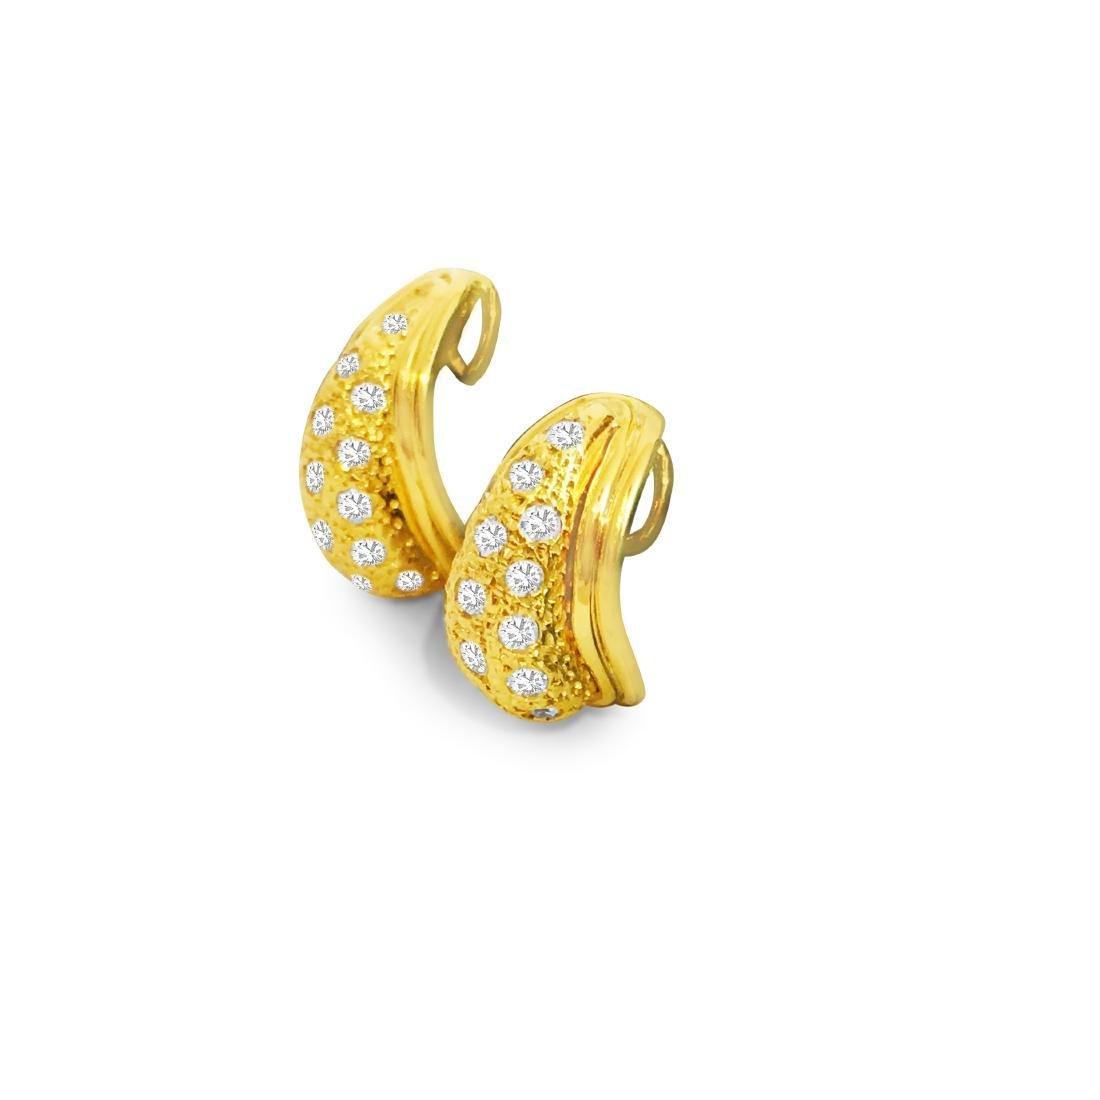 14K Yellow Gold, 1.00 CT Diamond Earrings - 5